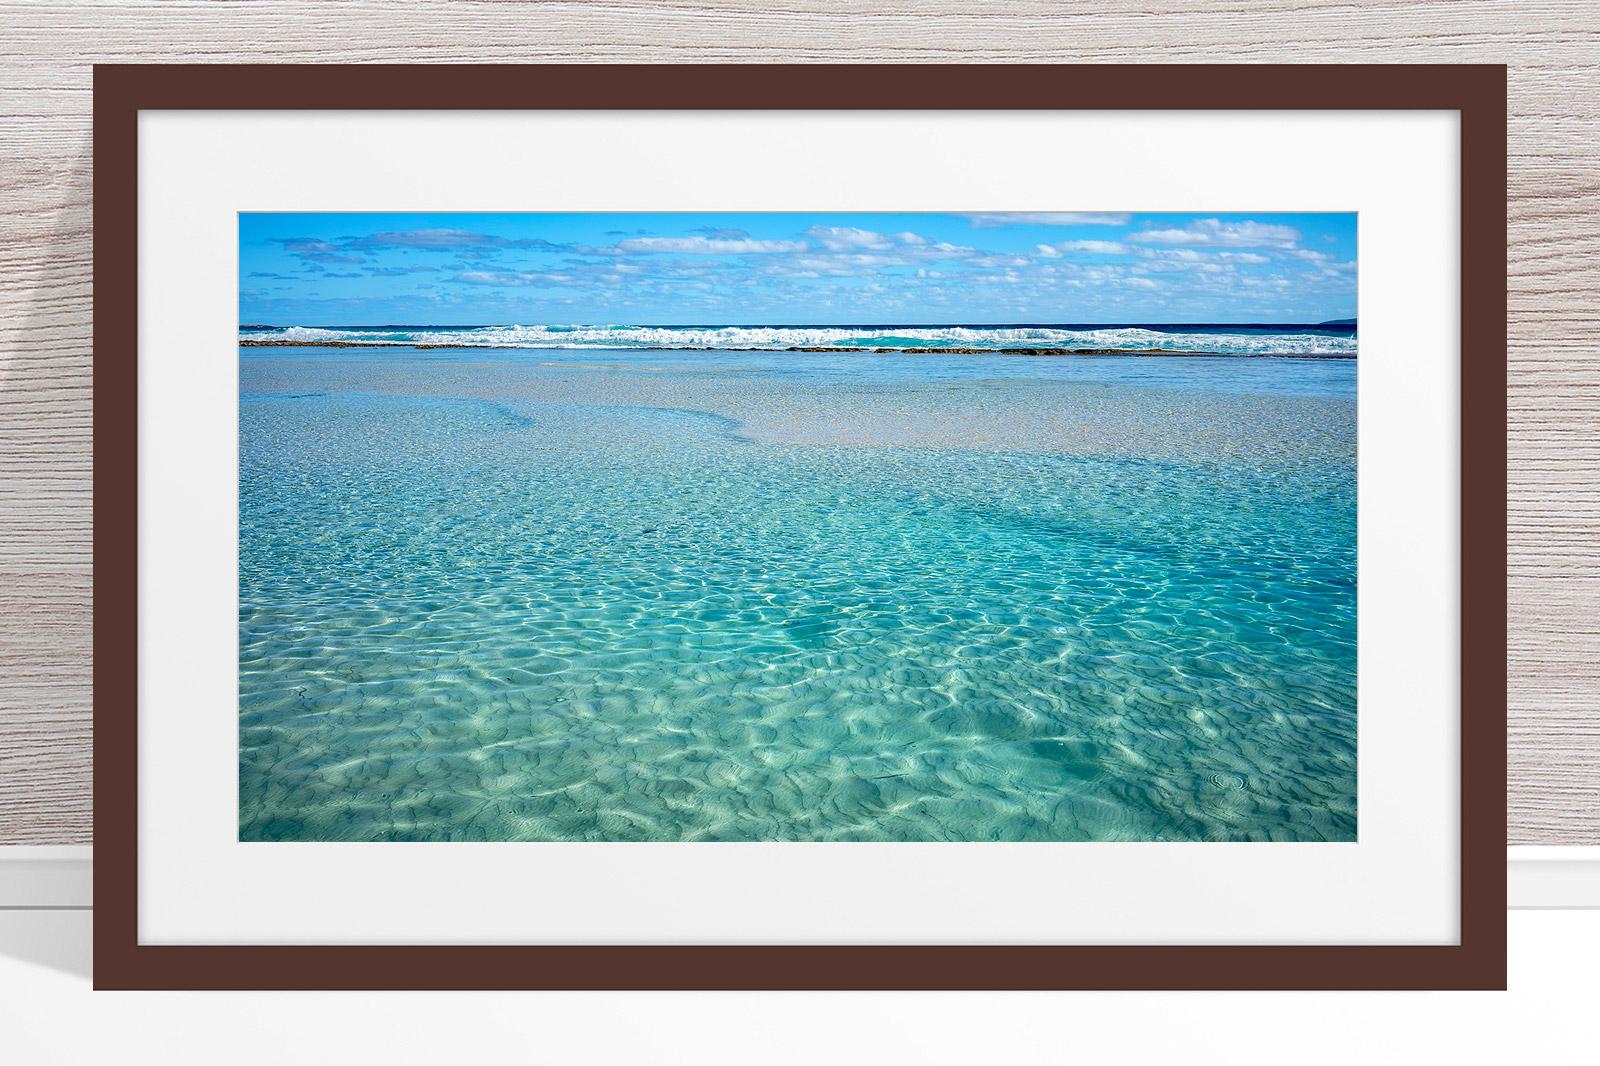 002 - Jason Mazur - 'Crystal Clear Waters, Esperance' Dark Frame